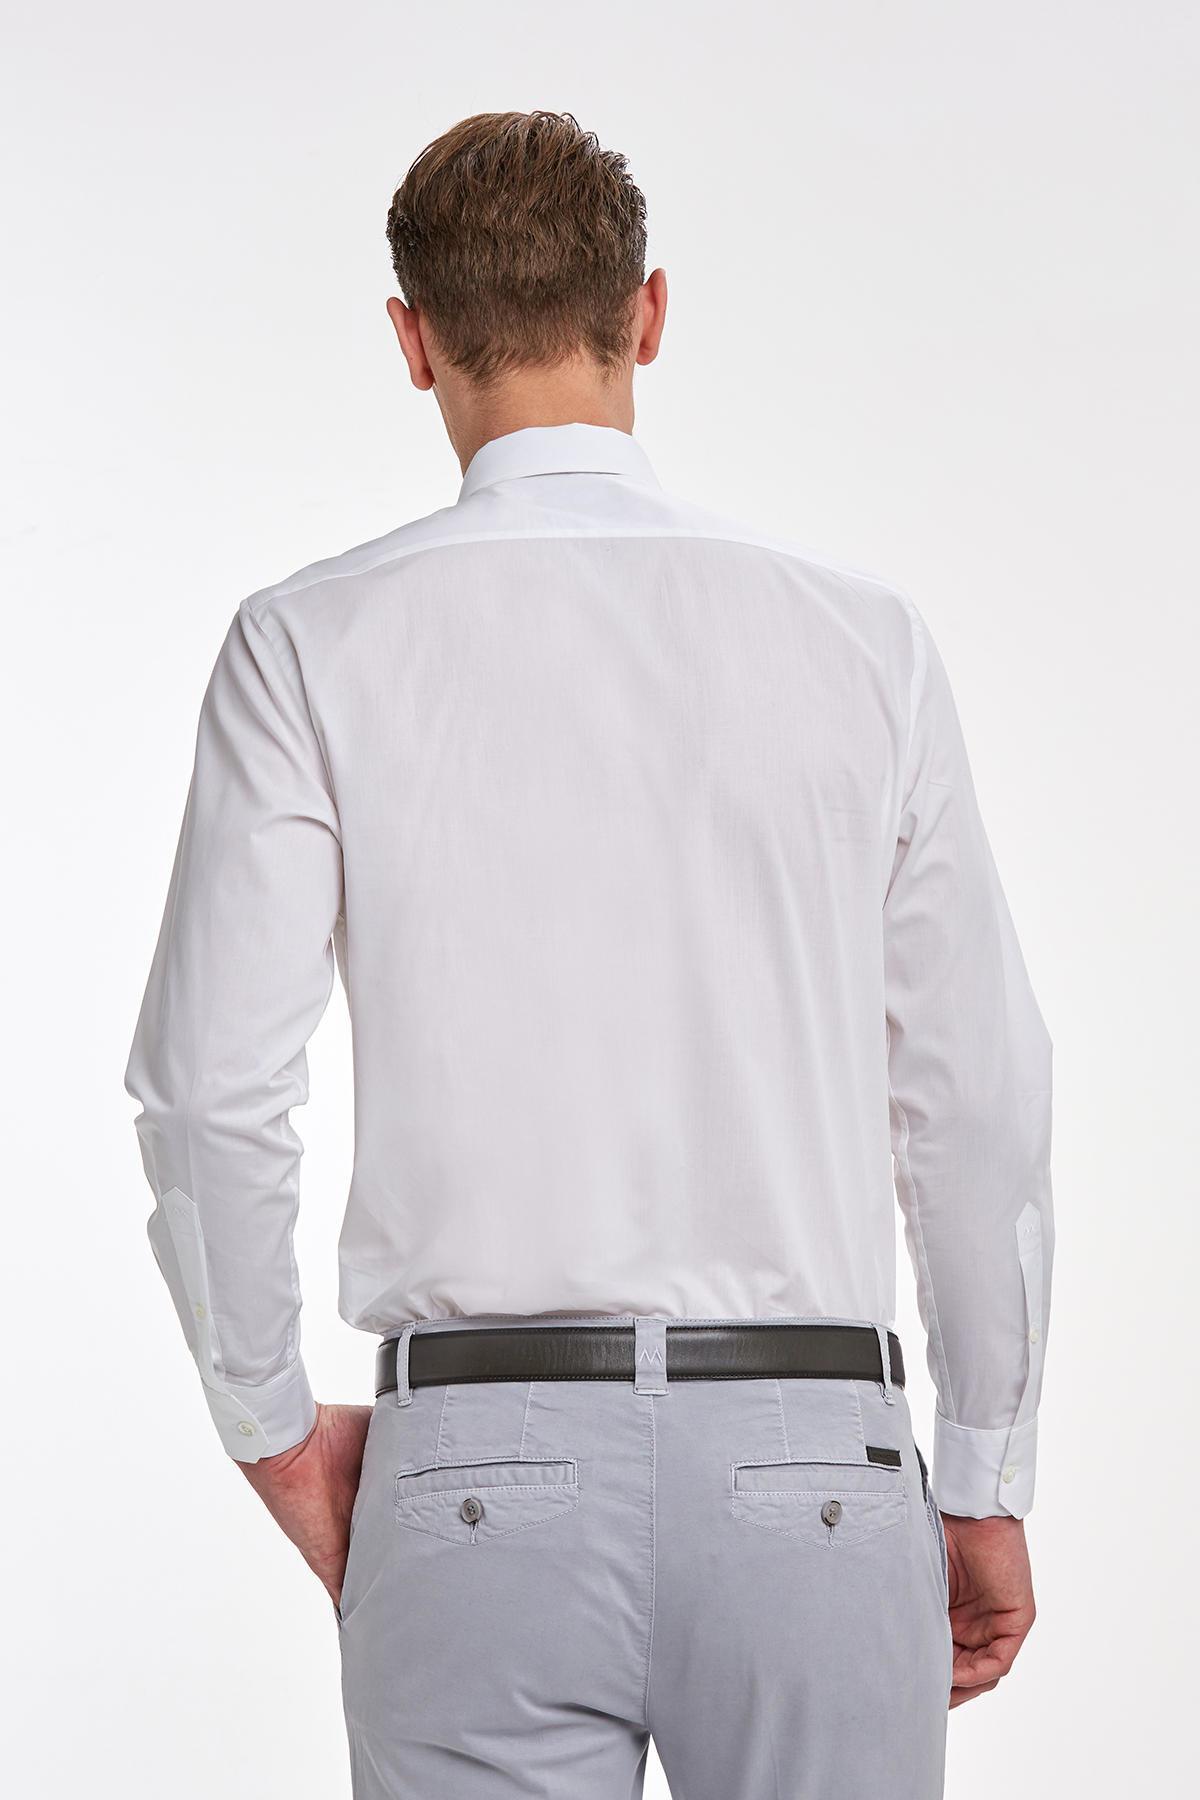 Beyaz İtalyan Yaka Pamuk Business Gömlek